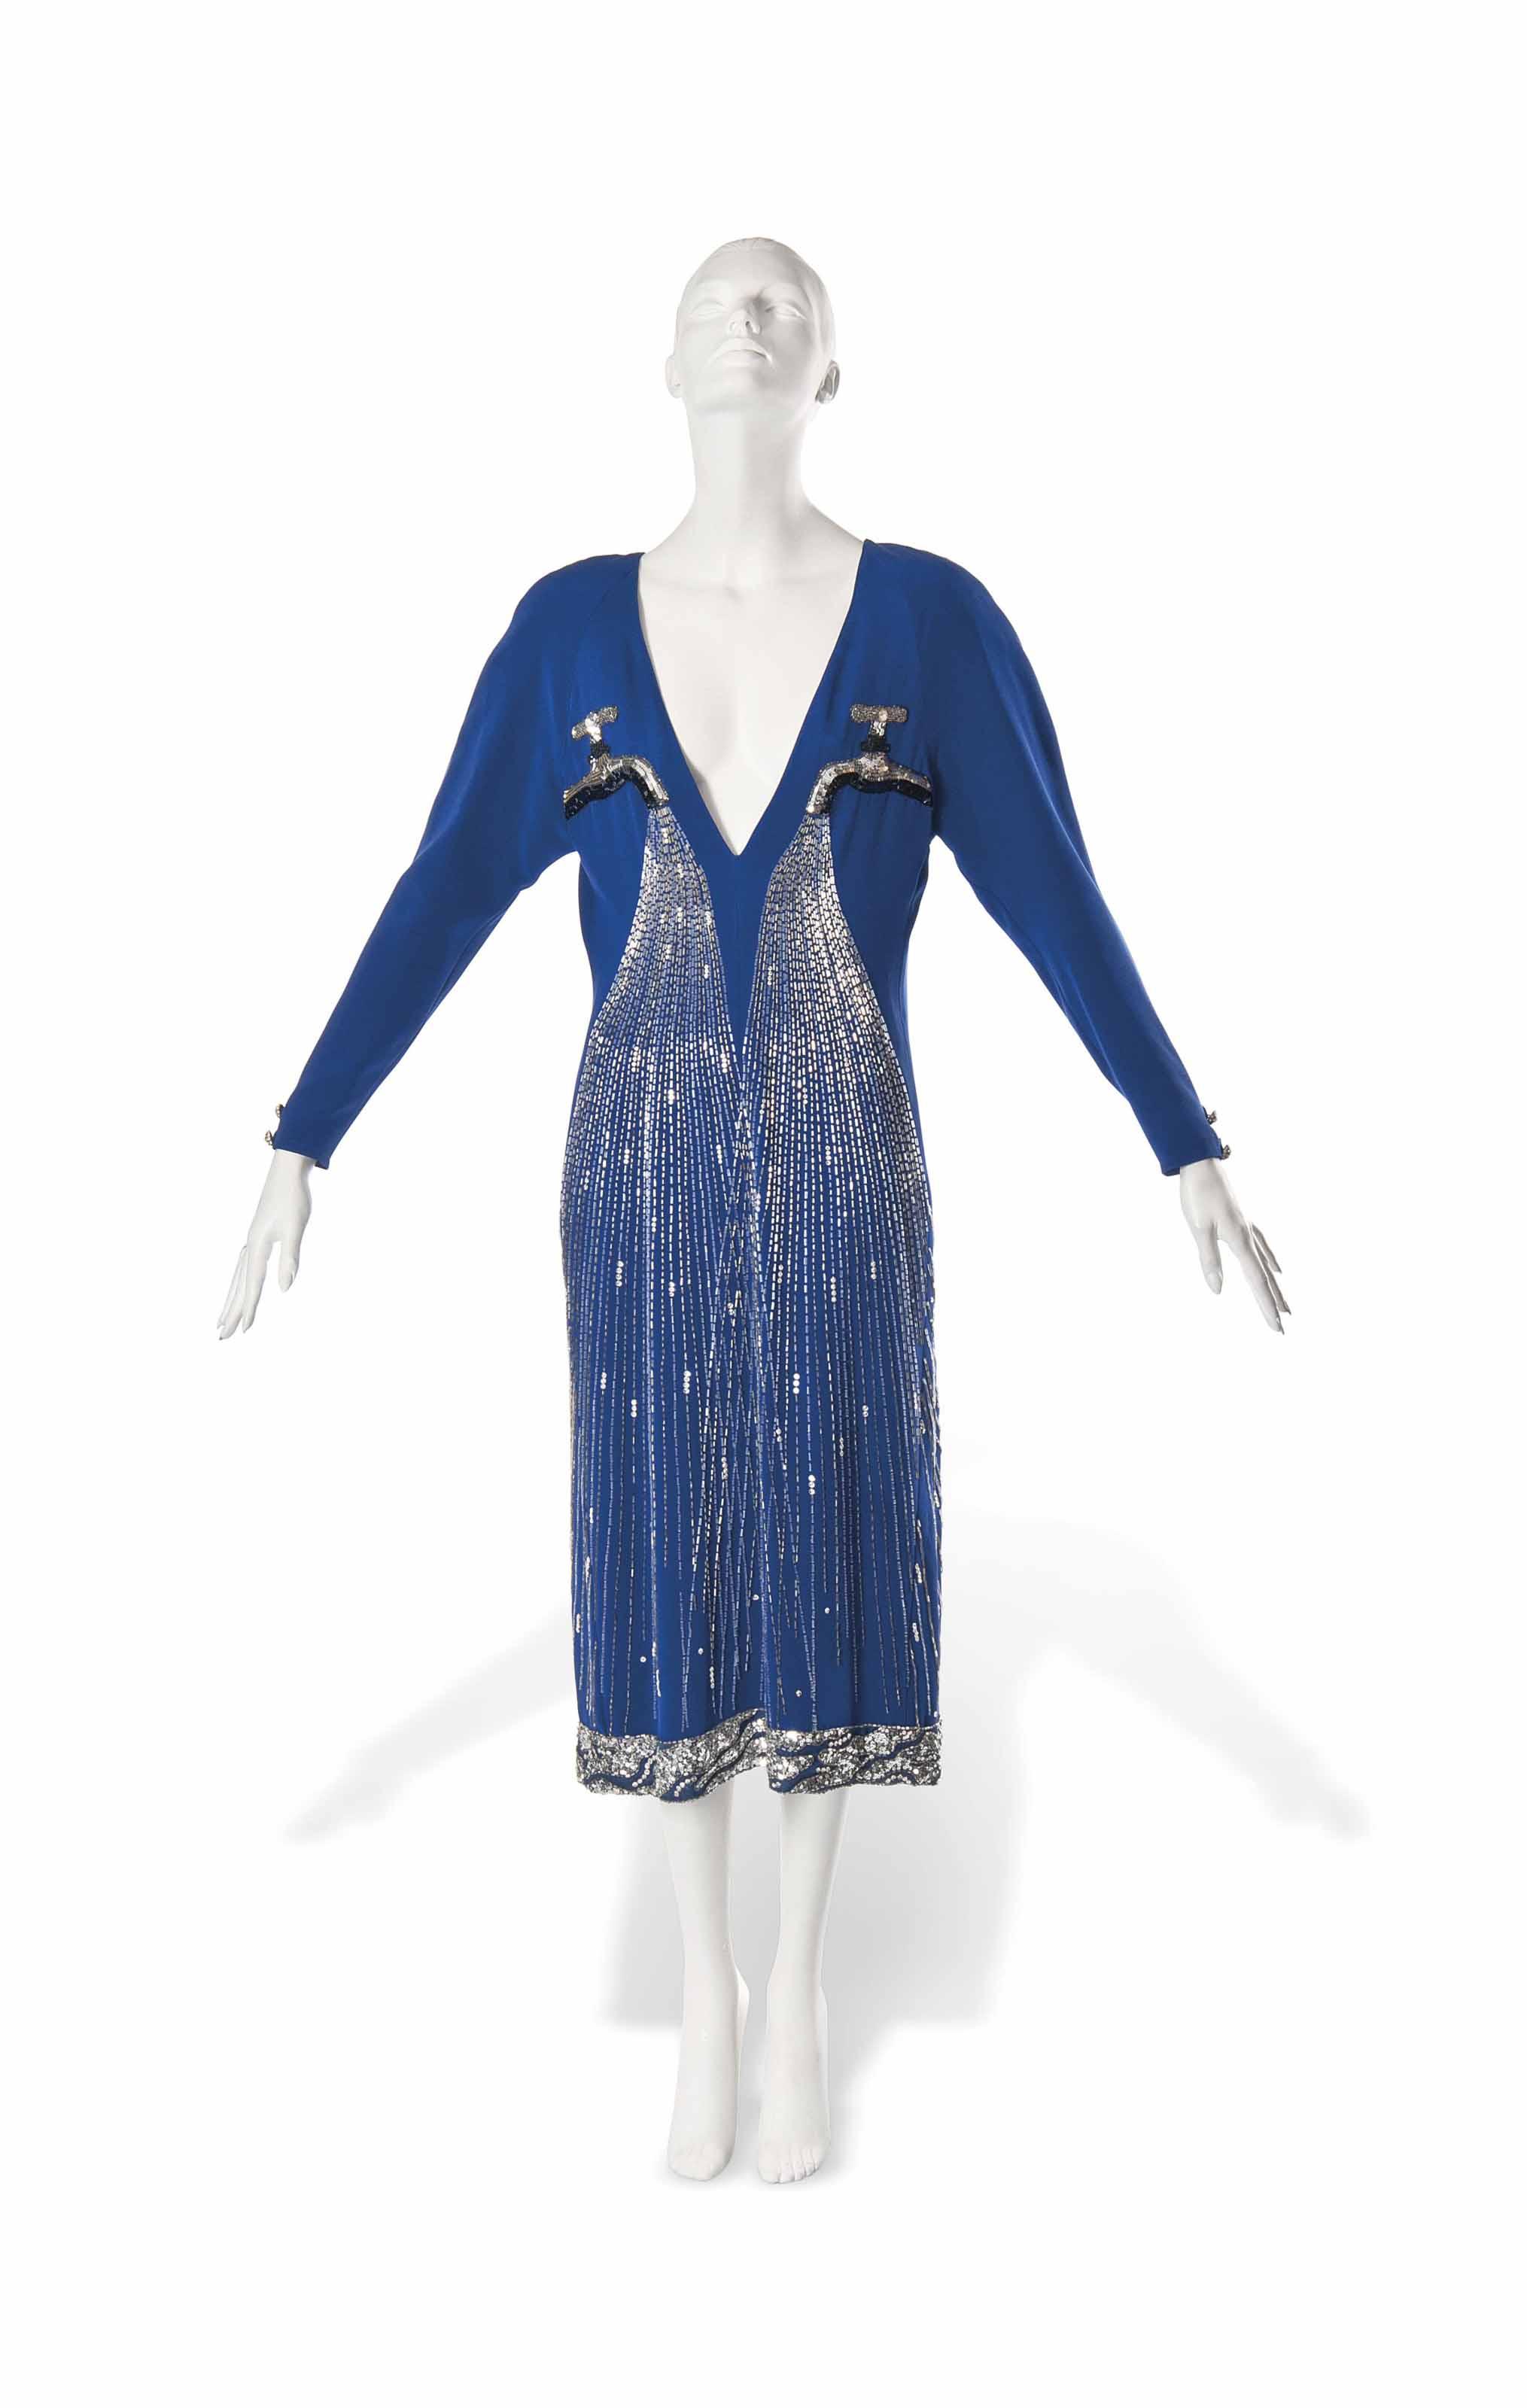 A KARL LAGERFELD FOR CHLOÉ ROYAL BLUE SATIN DRESS